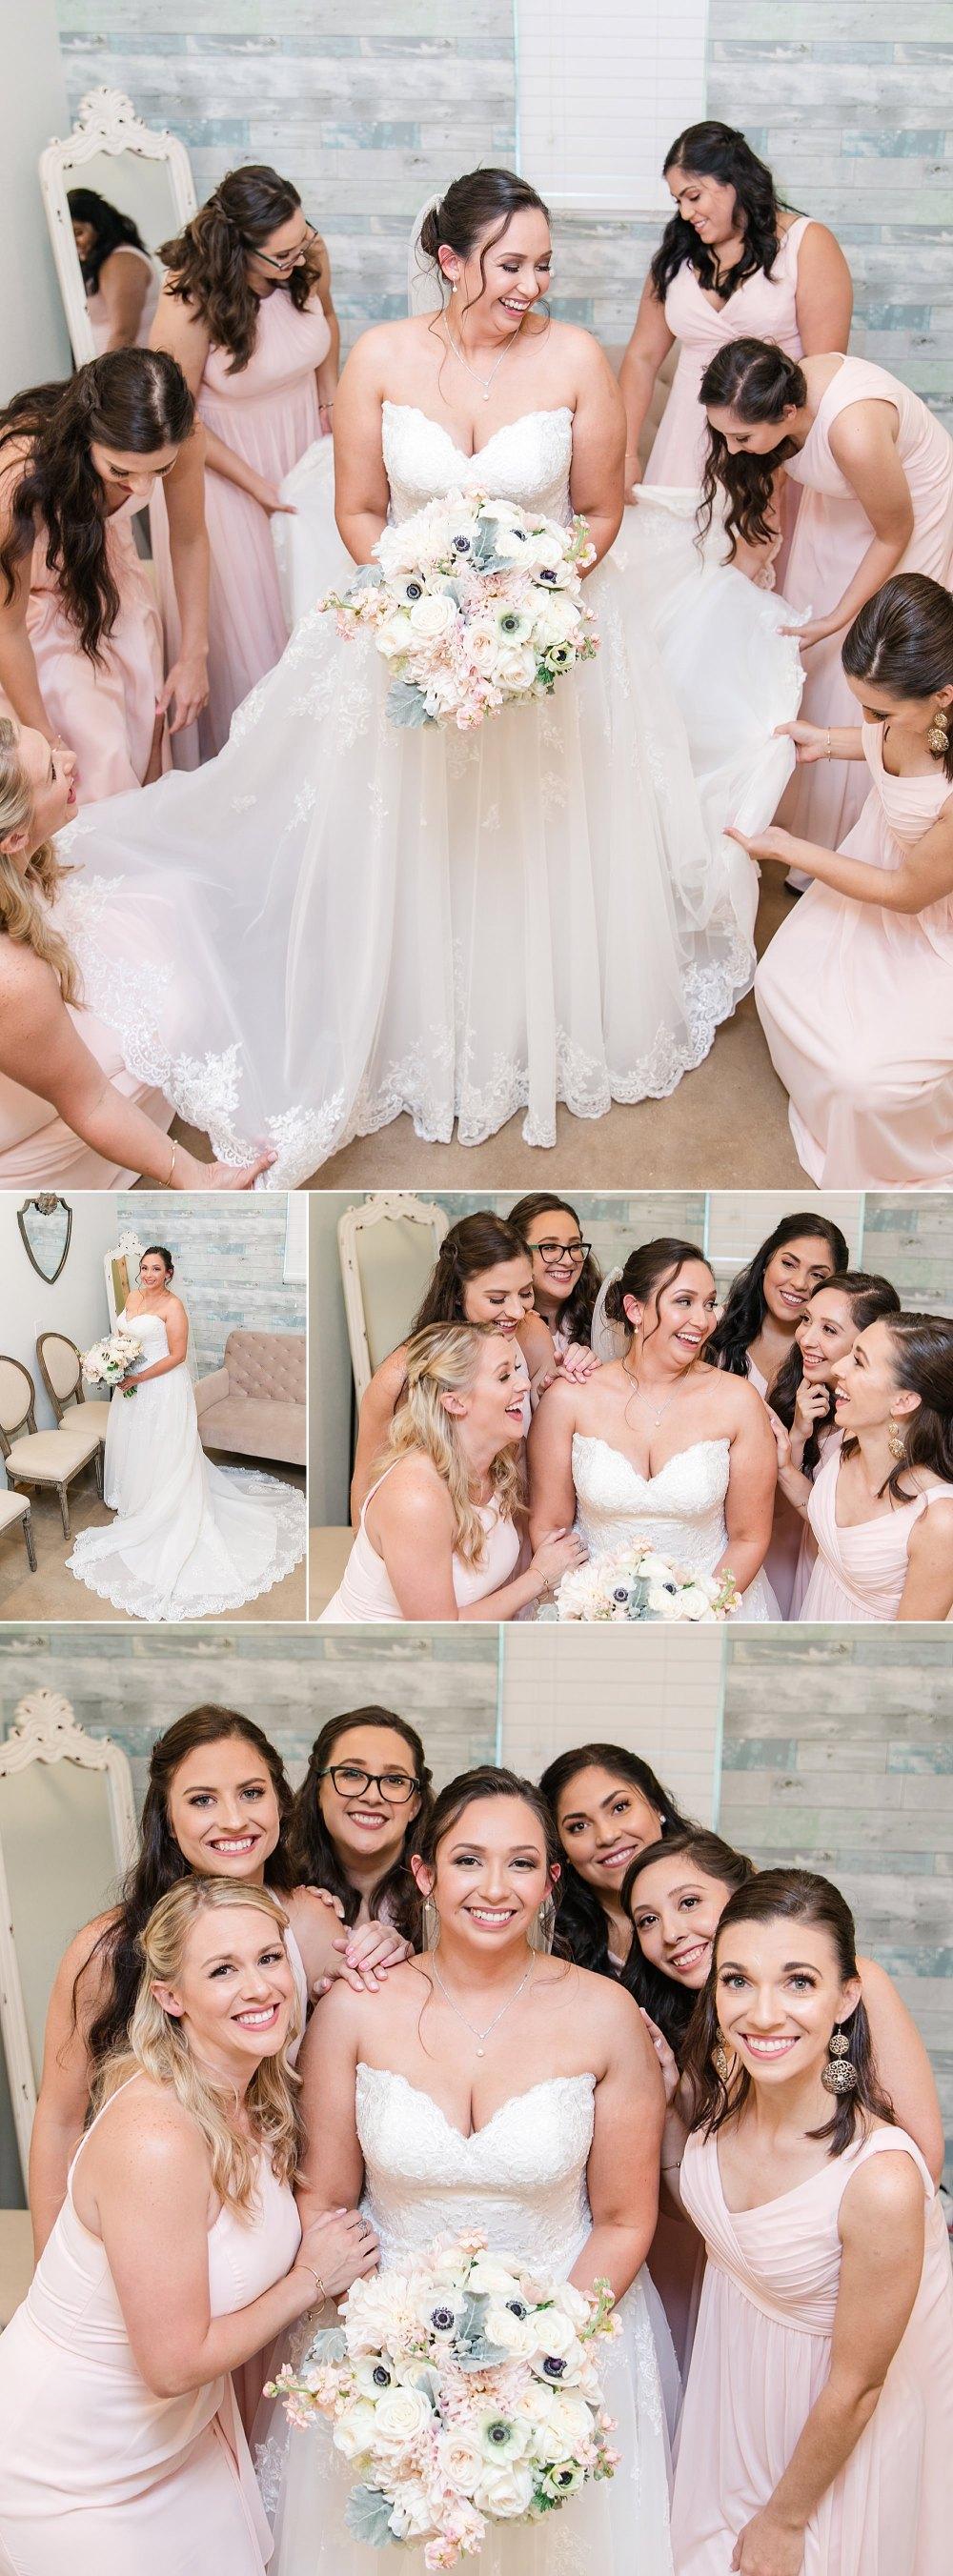 Wedding-Photographer-Bulverde-Texas-Western-Sky-Event-Venue-Carly-Barton-Photography_0023.jpg